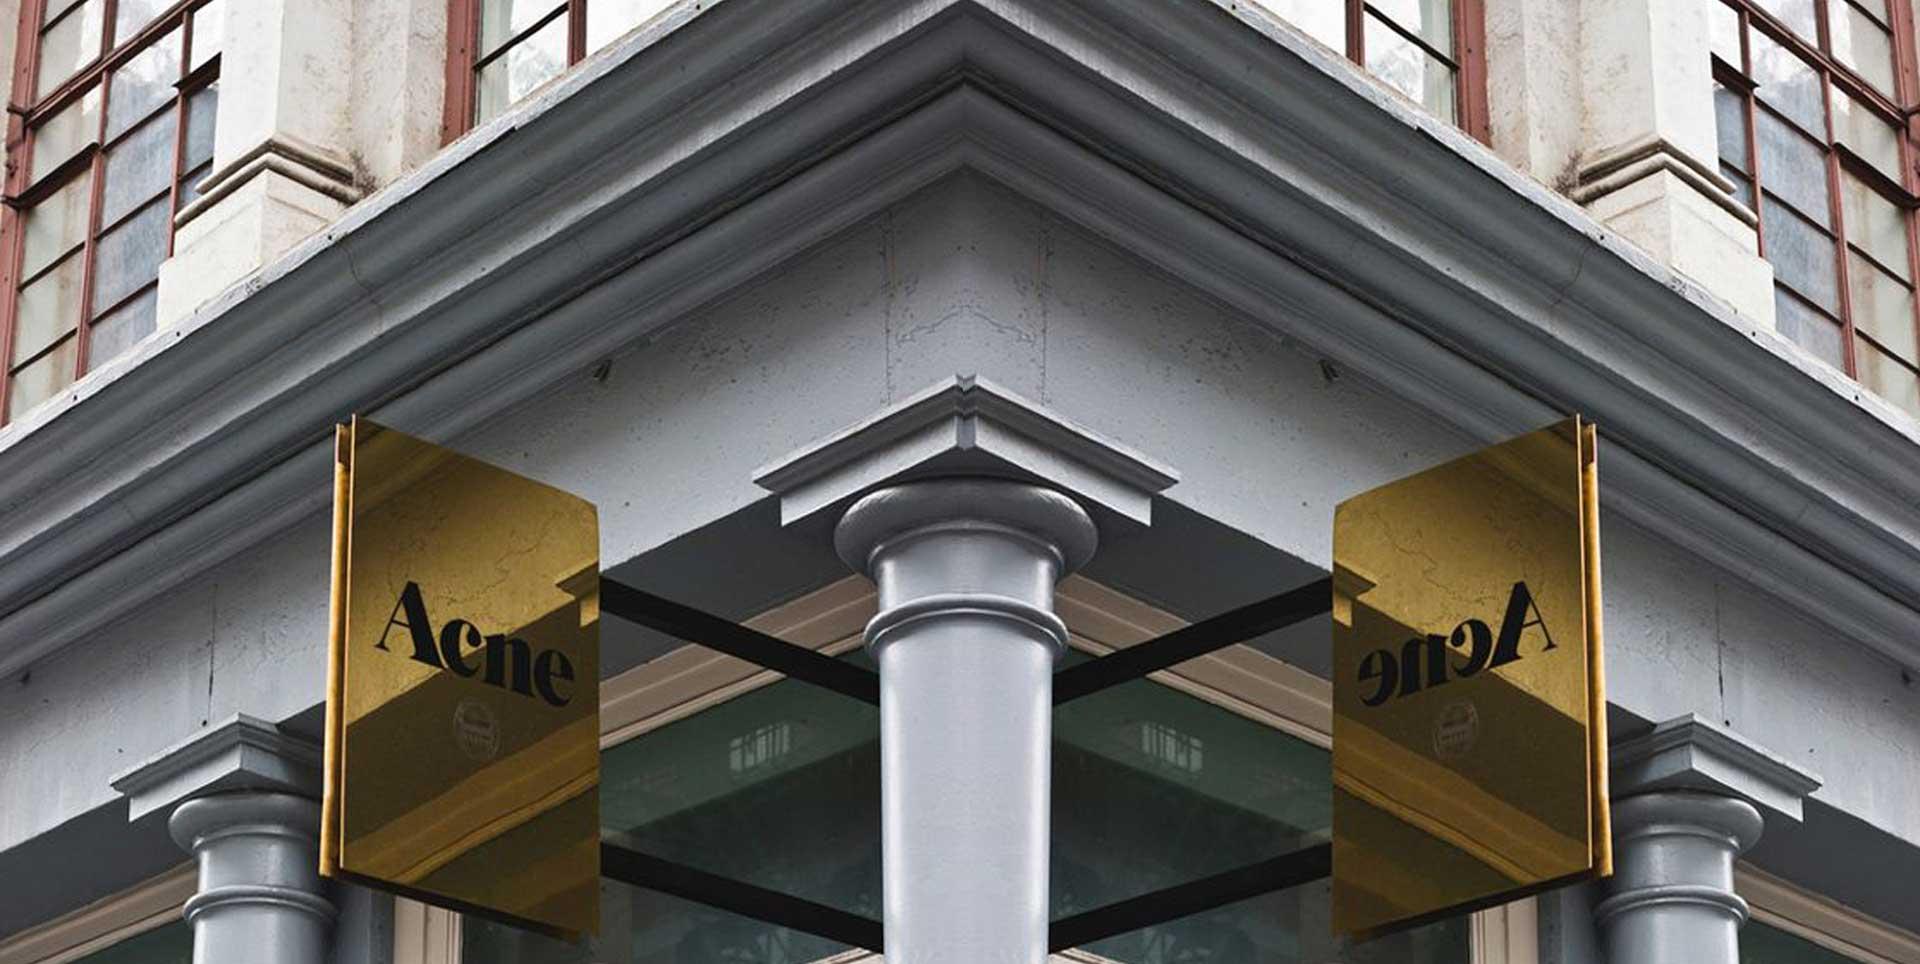 pirinc-kutu-harf-tabela-1